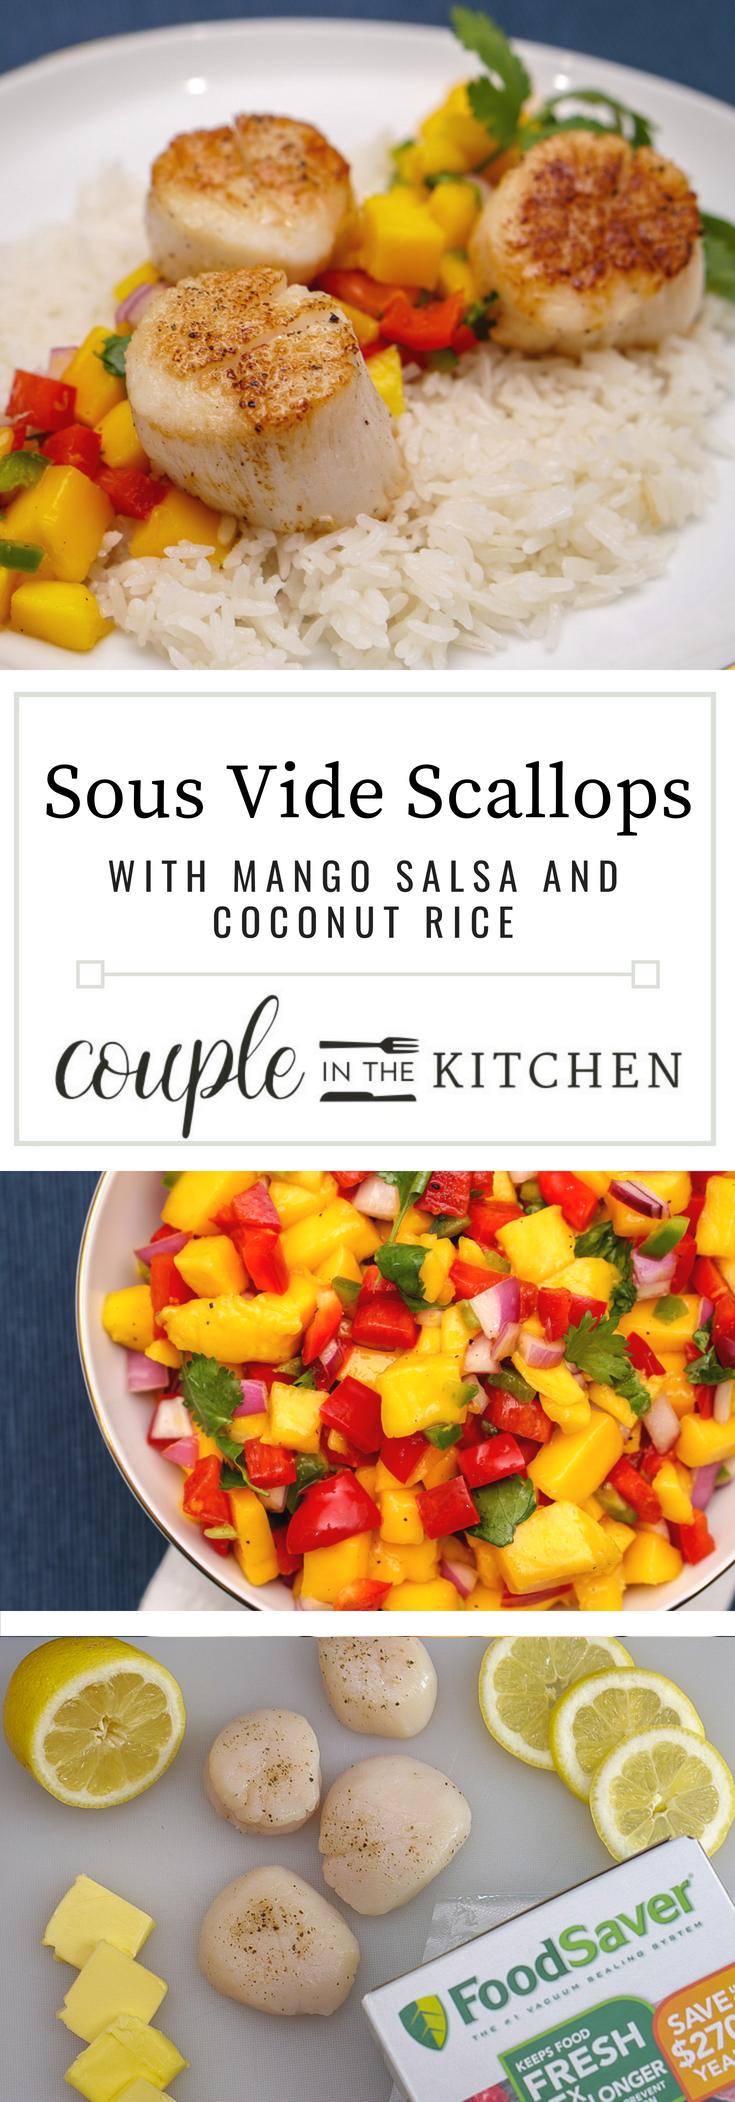 Sous Vide Scallops with Mango Salsa and Coconut Rice   coupleinthekitchen.com